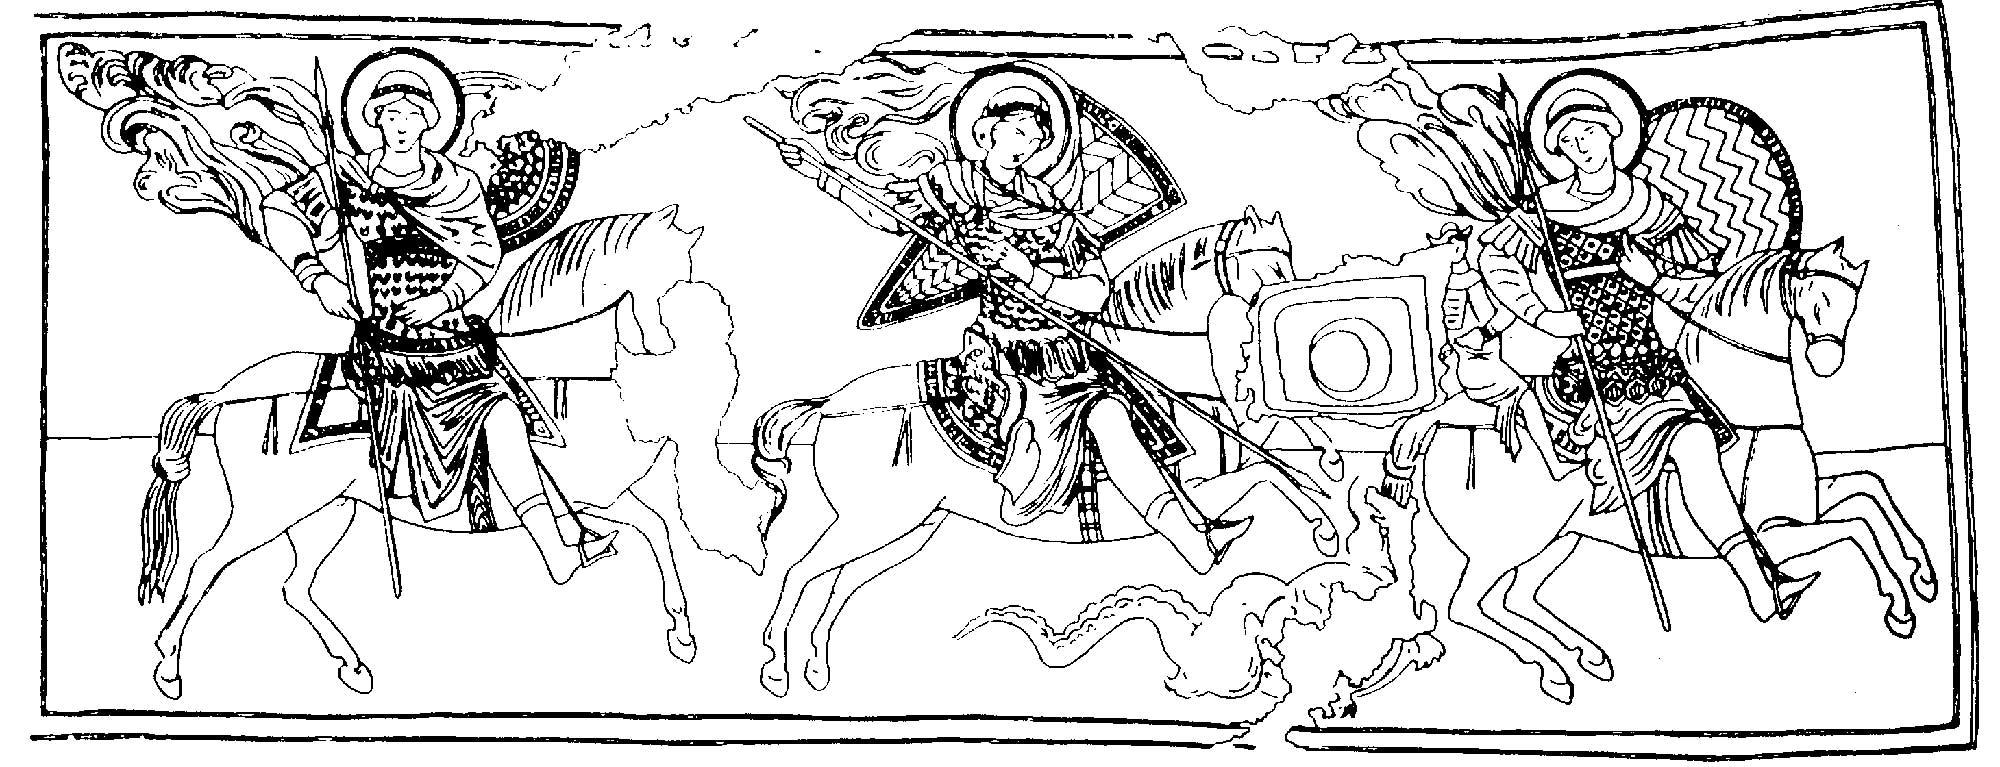 Three images of the Warrior Saint on horseback